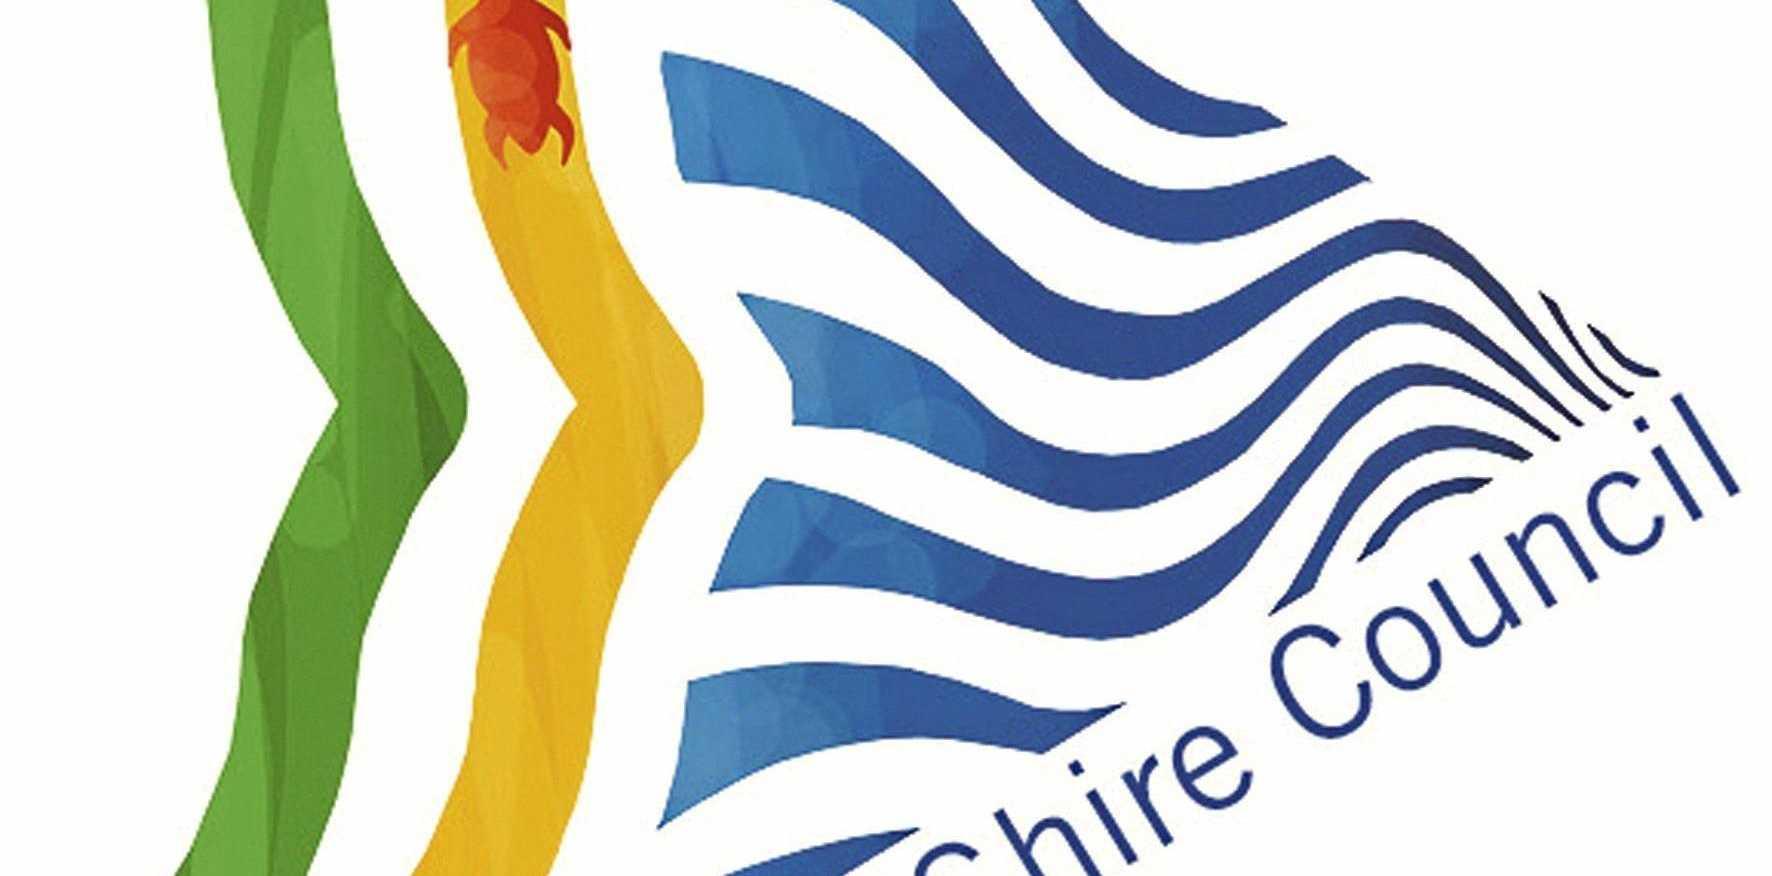 LOGO: Byron Shire Council